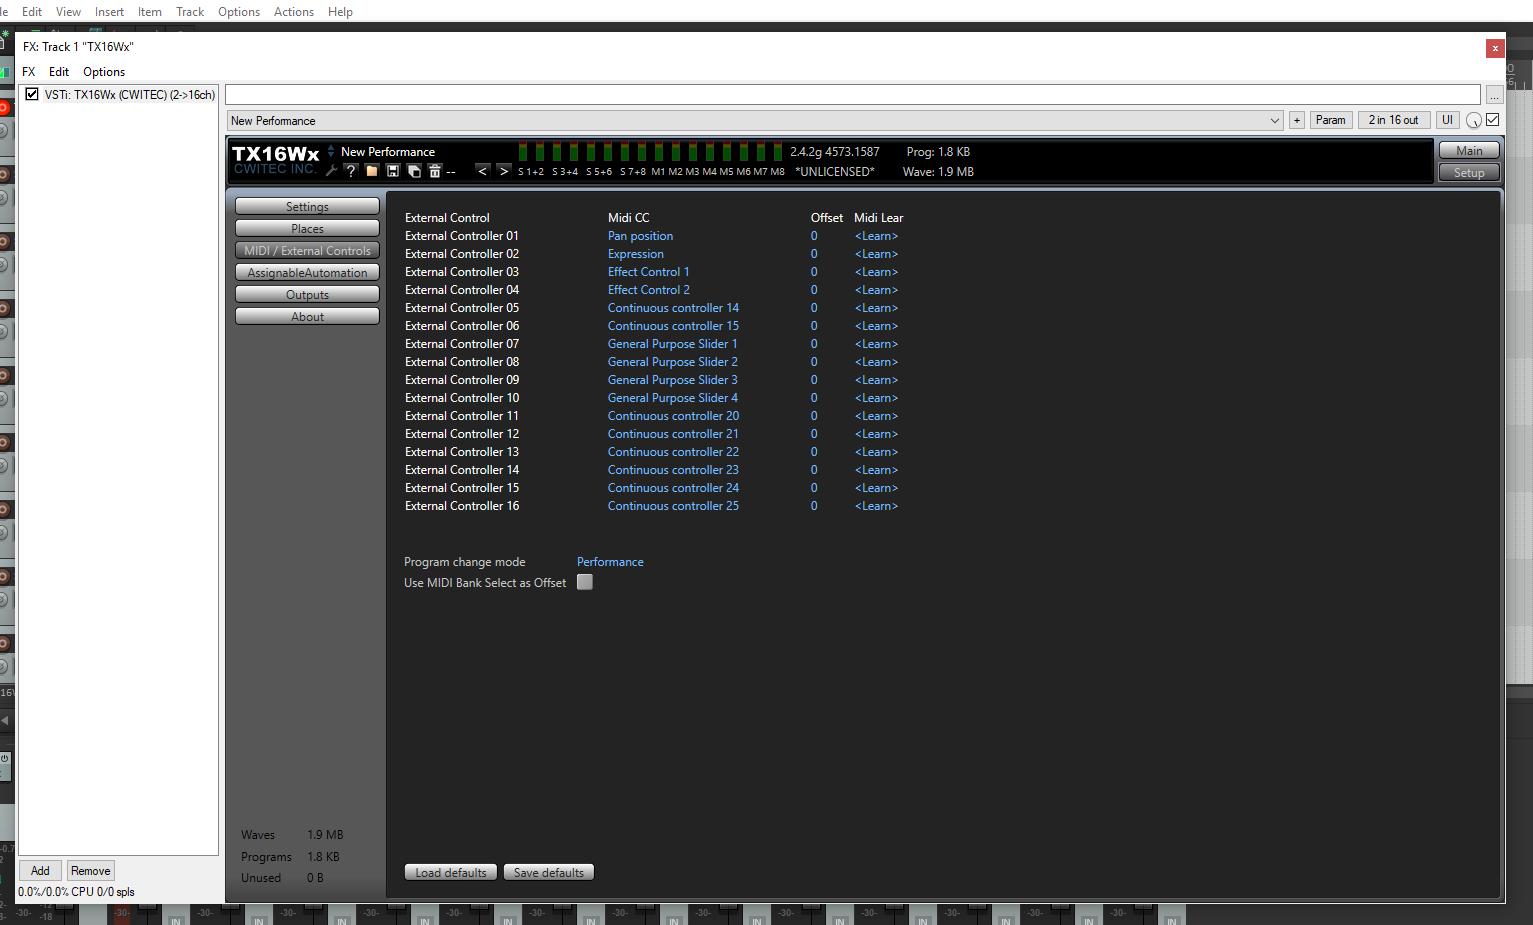 Probleme mit dem TX16Wx Sampler und dem MPD218 - Midi CC | Recording de